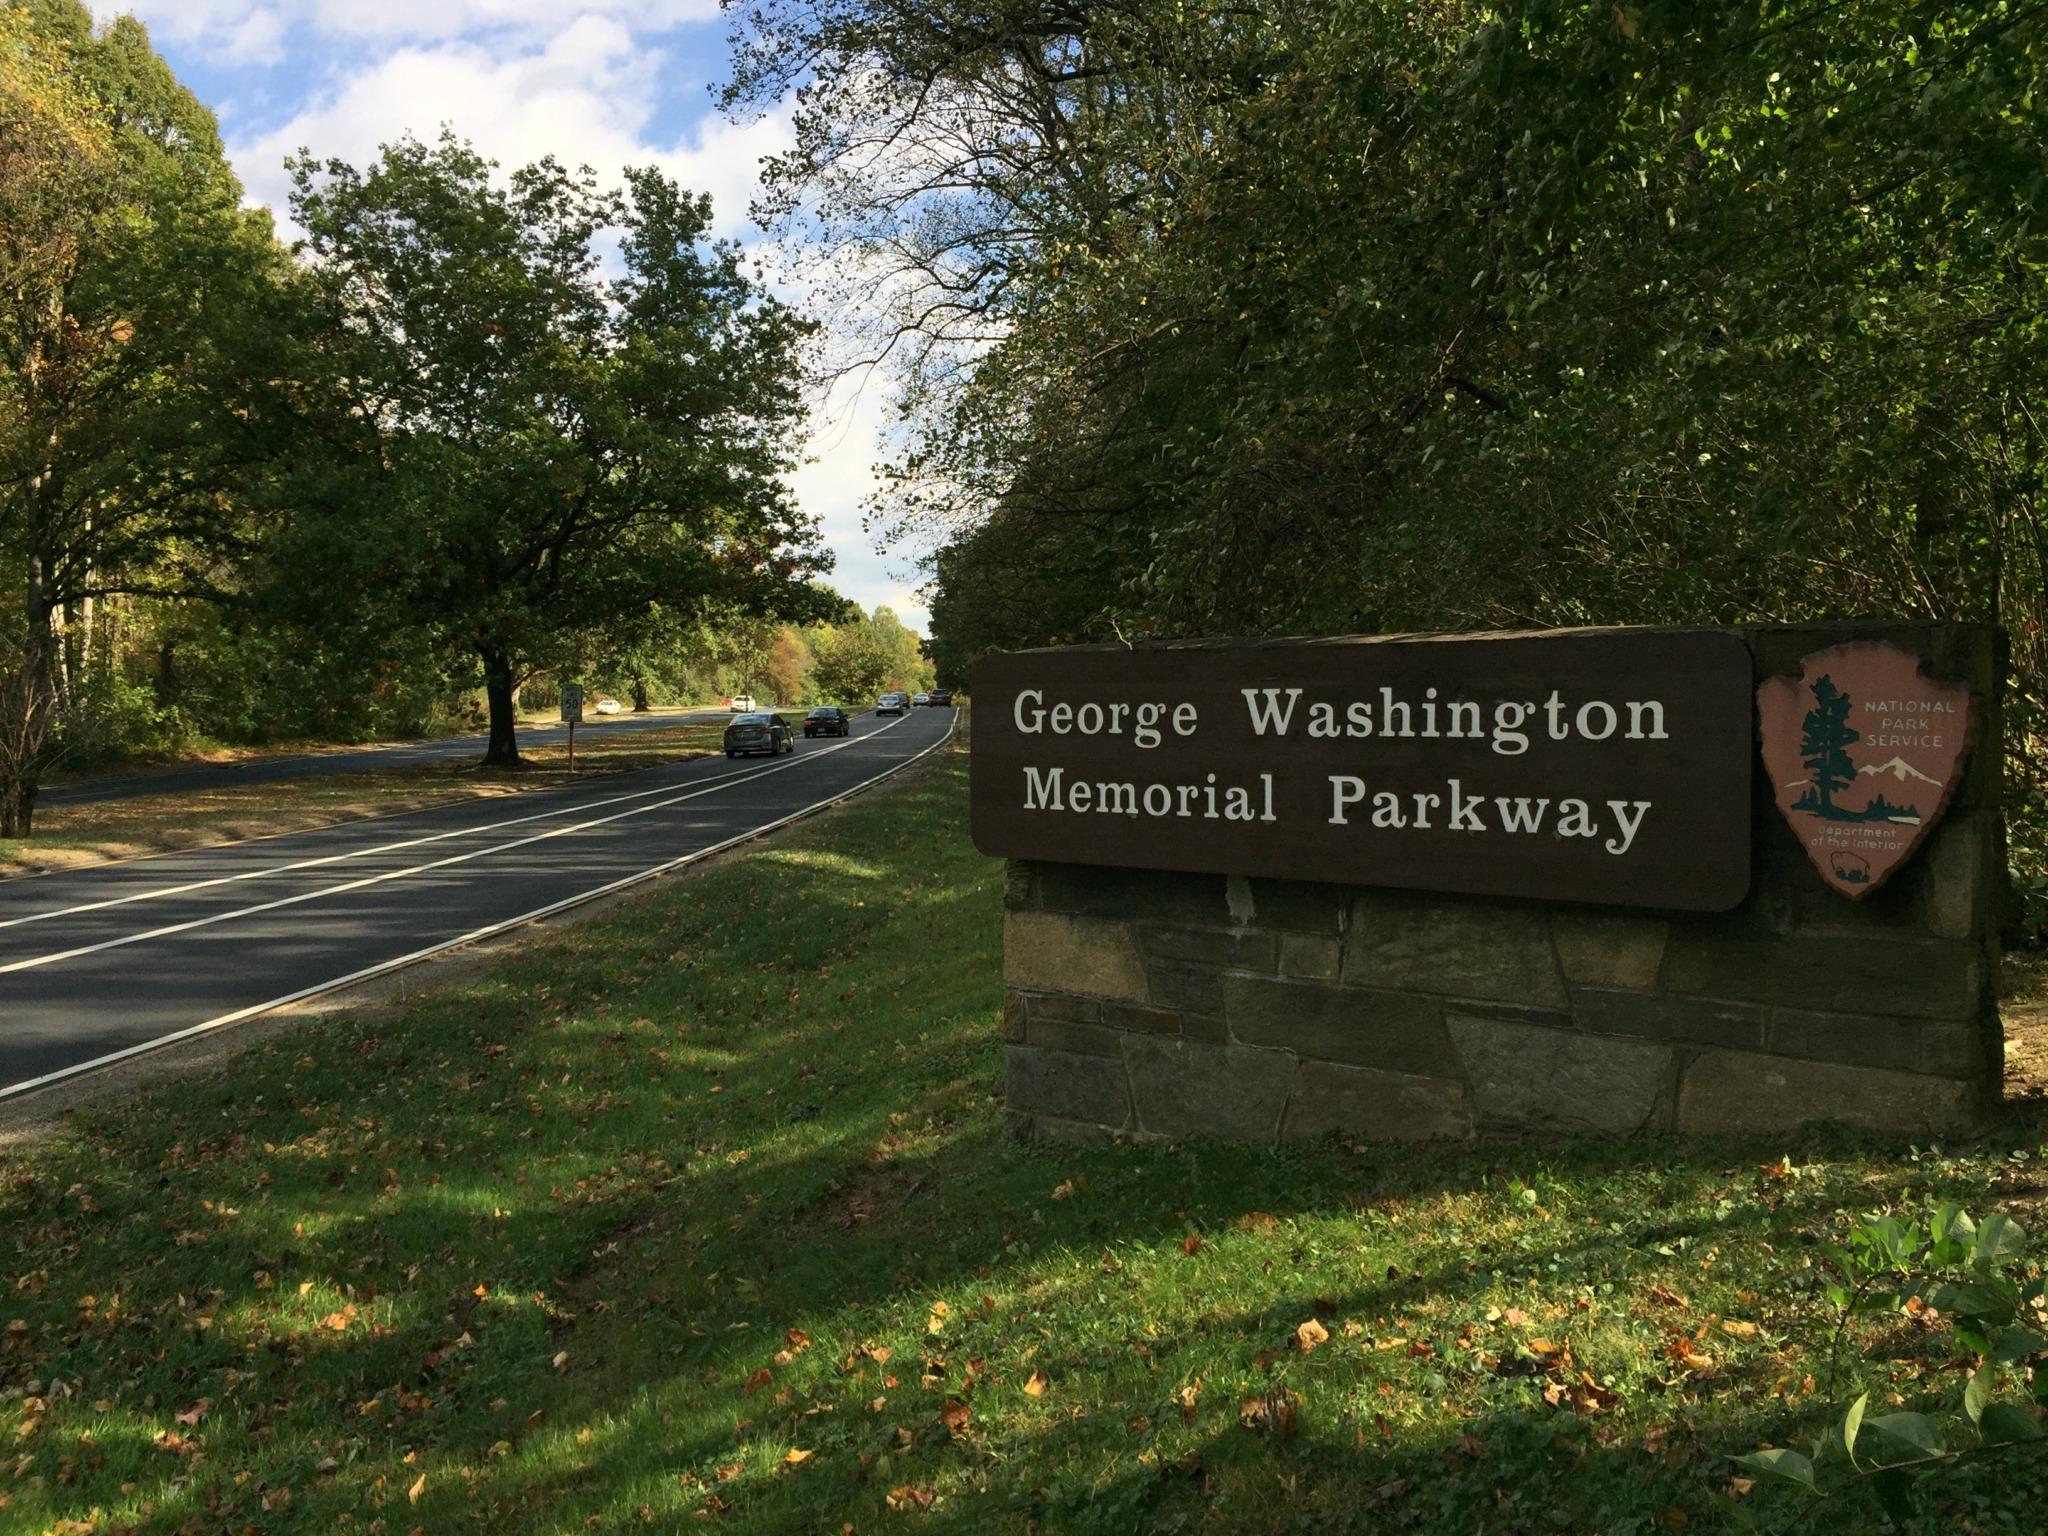 GW Parkway Entrance